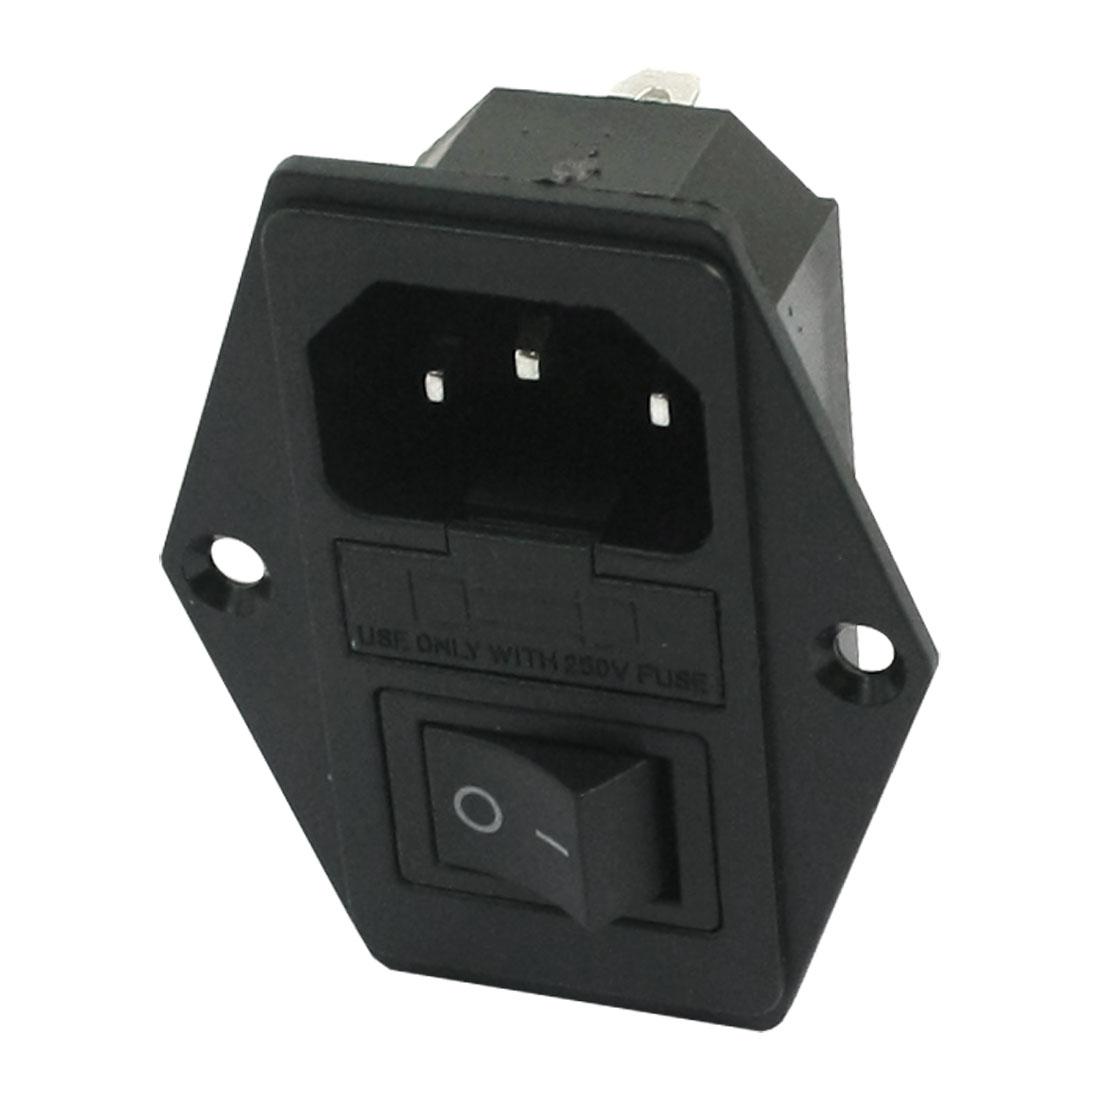 AC 250V 10A 5x20mm Fuse Holder Rocker Switch IEC320 C14 Male Plug Inlet Power Socket Black